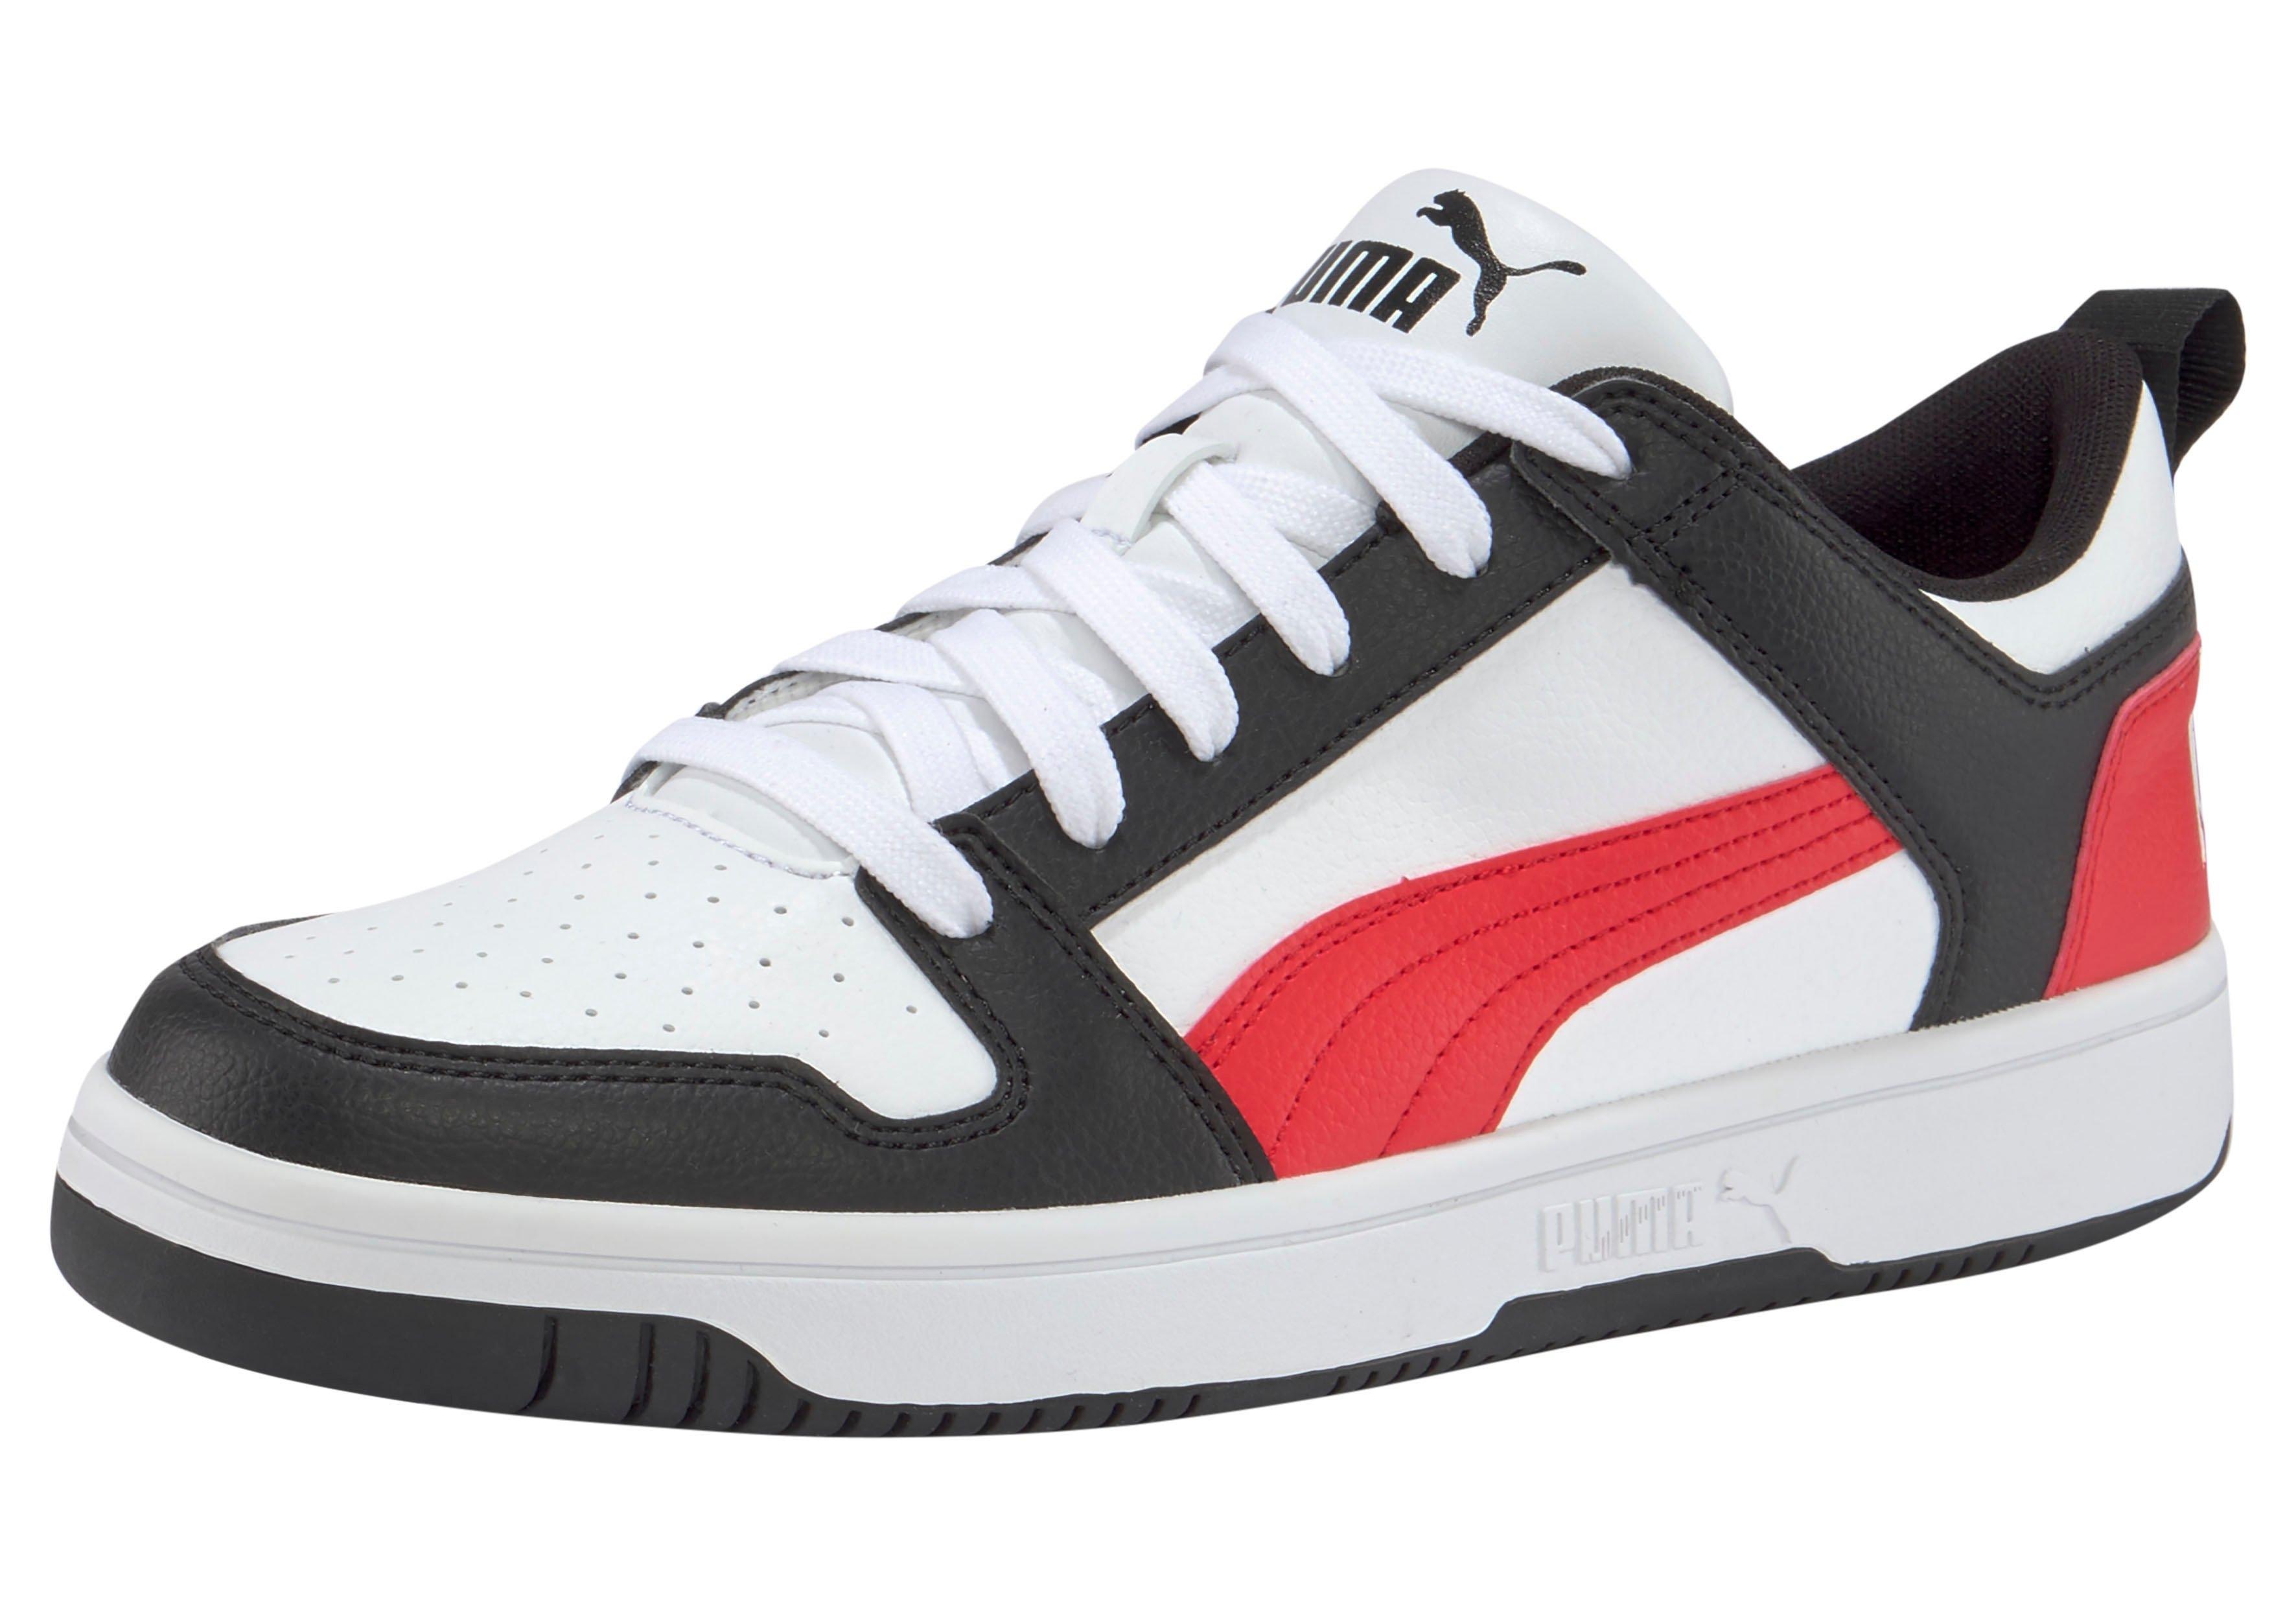 PUMA sneakers Puma Rebound Layup Lo SL - gratis ruilen op otto.nl